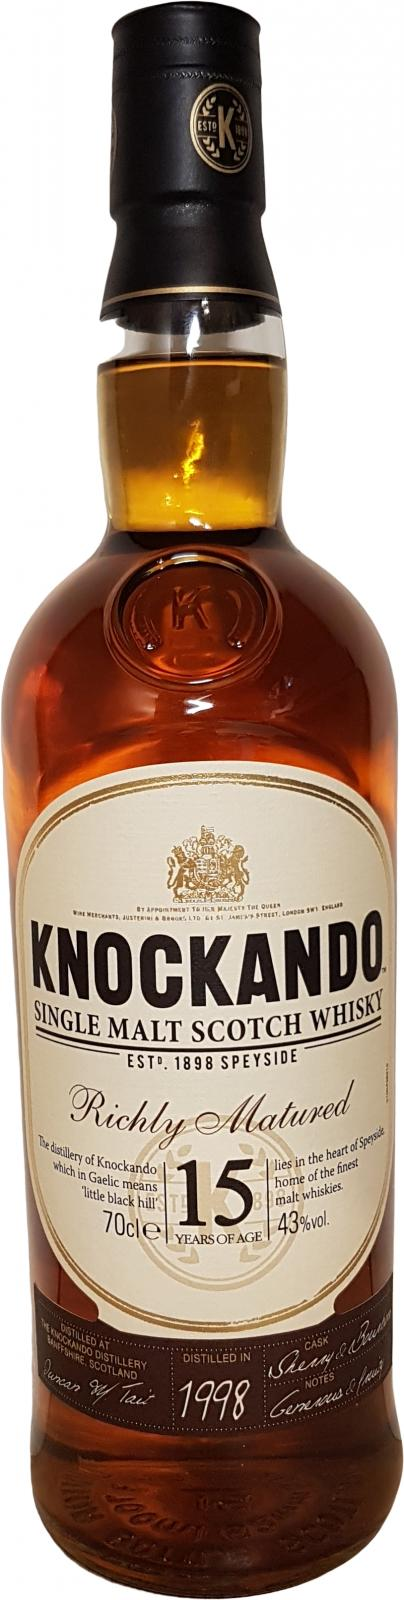 Knockando 1998